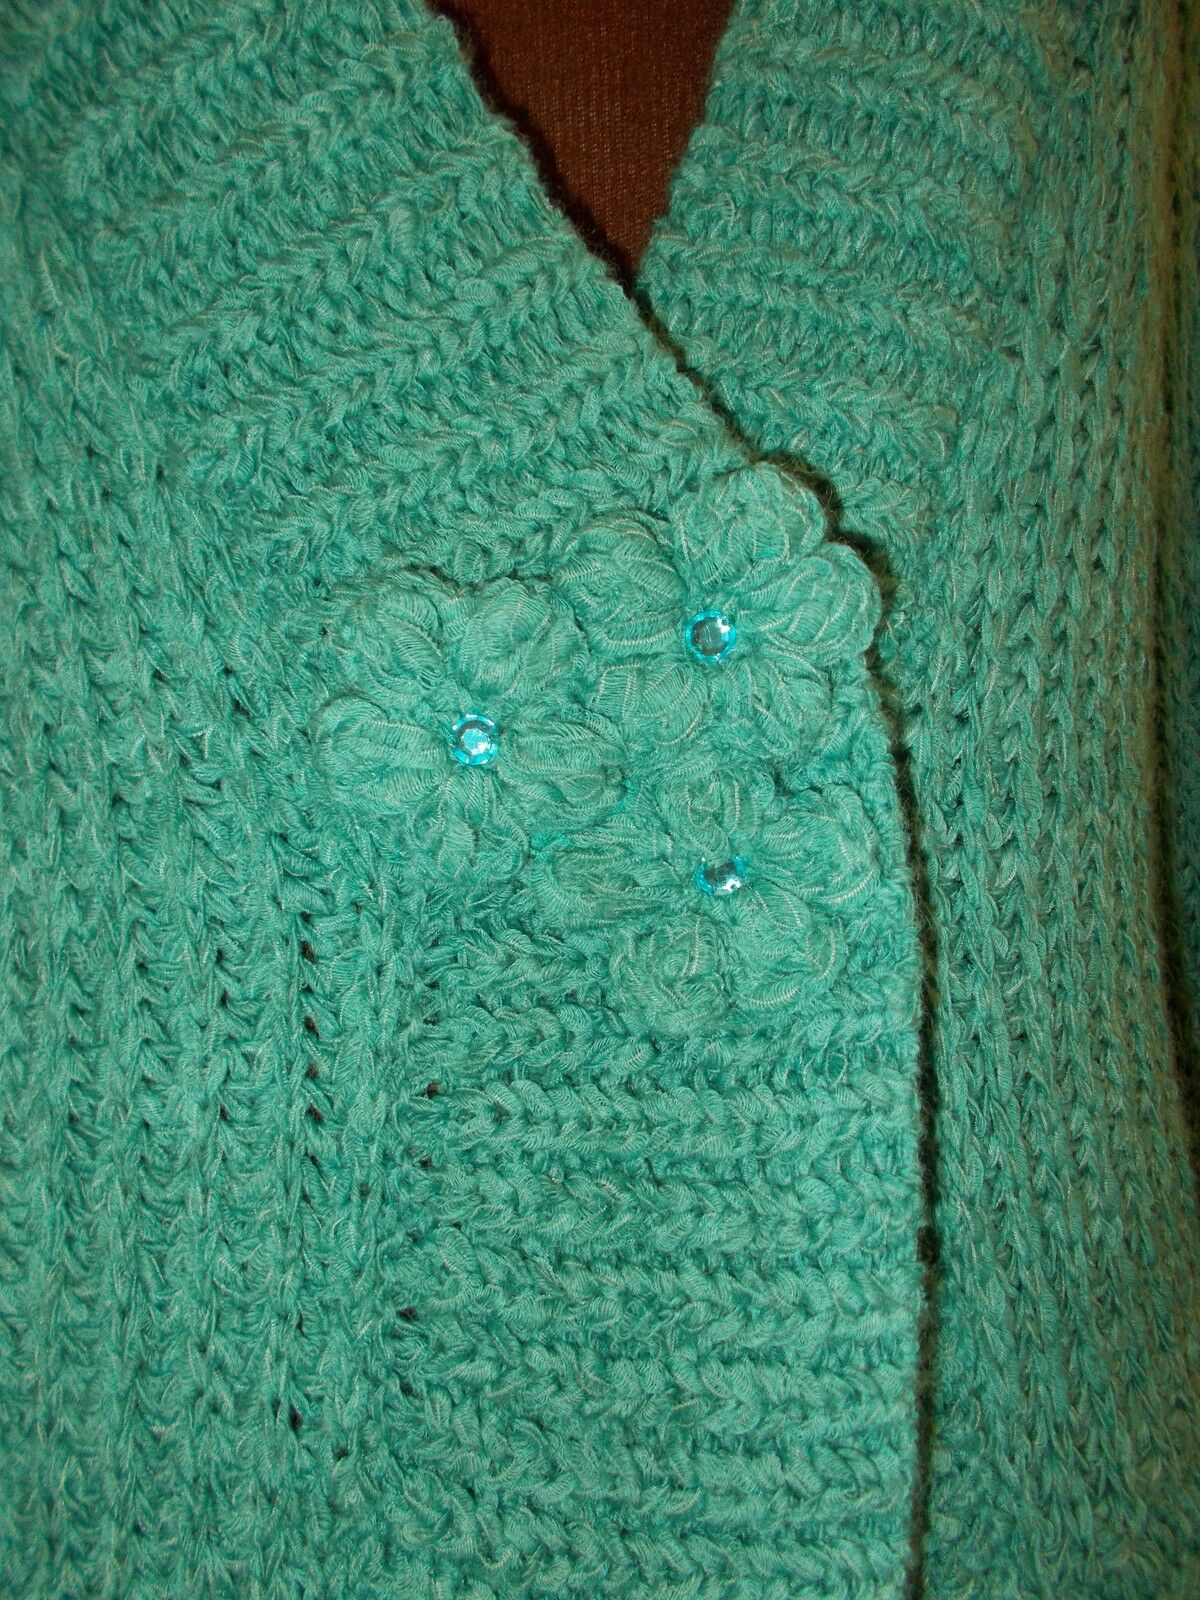 PER PER PER UNA turquoise bluee-green WOOL knitted long sleeve cardigan jumper top M M&S aeb78c